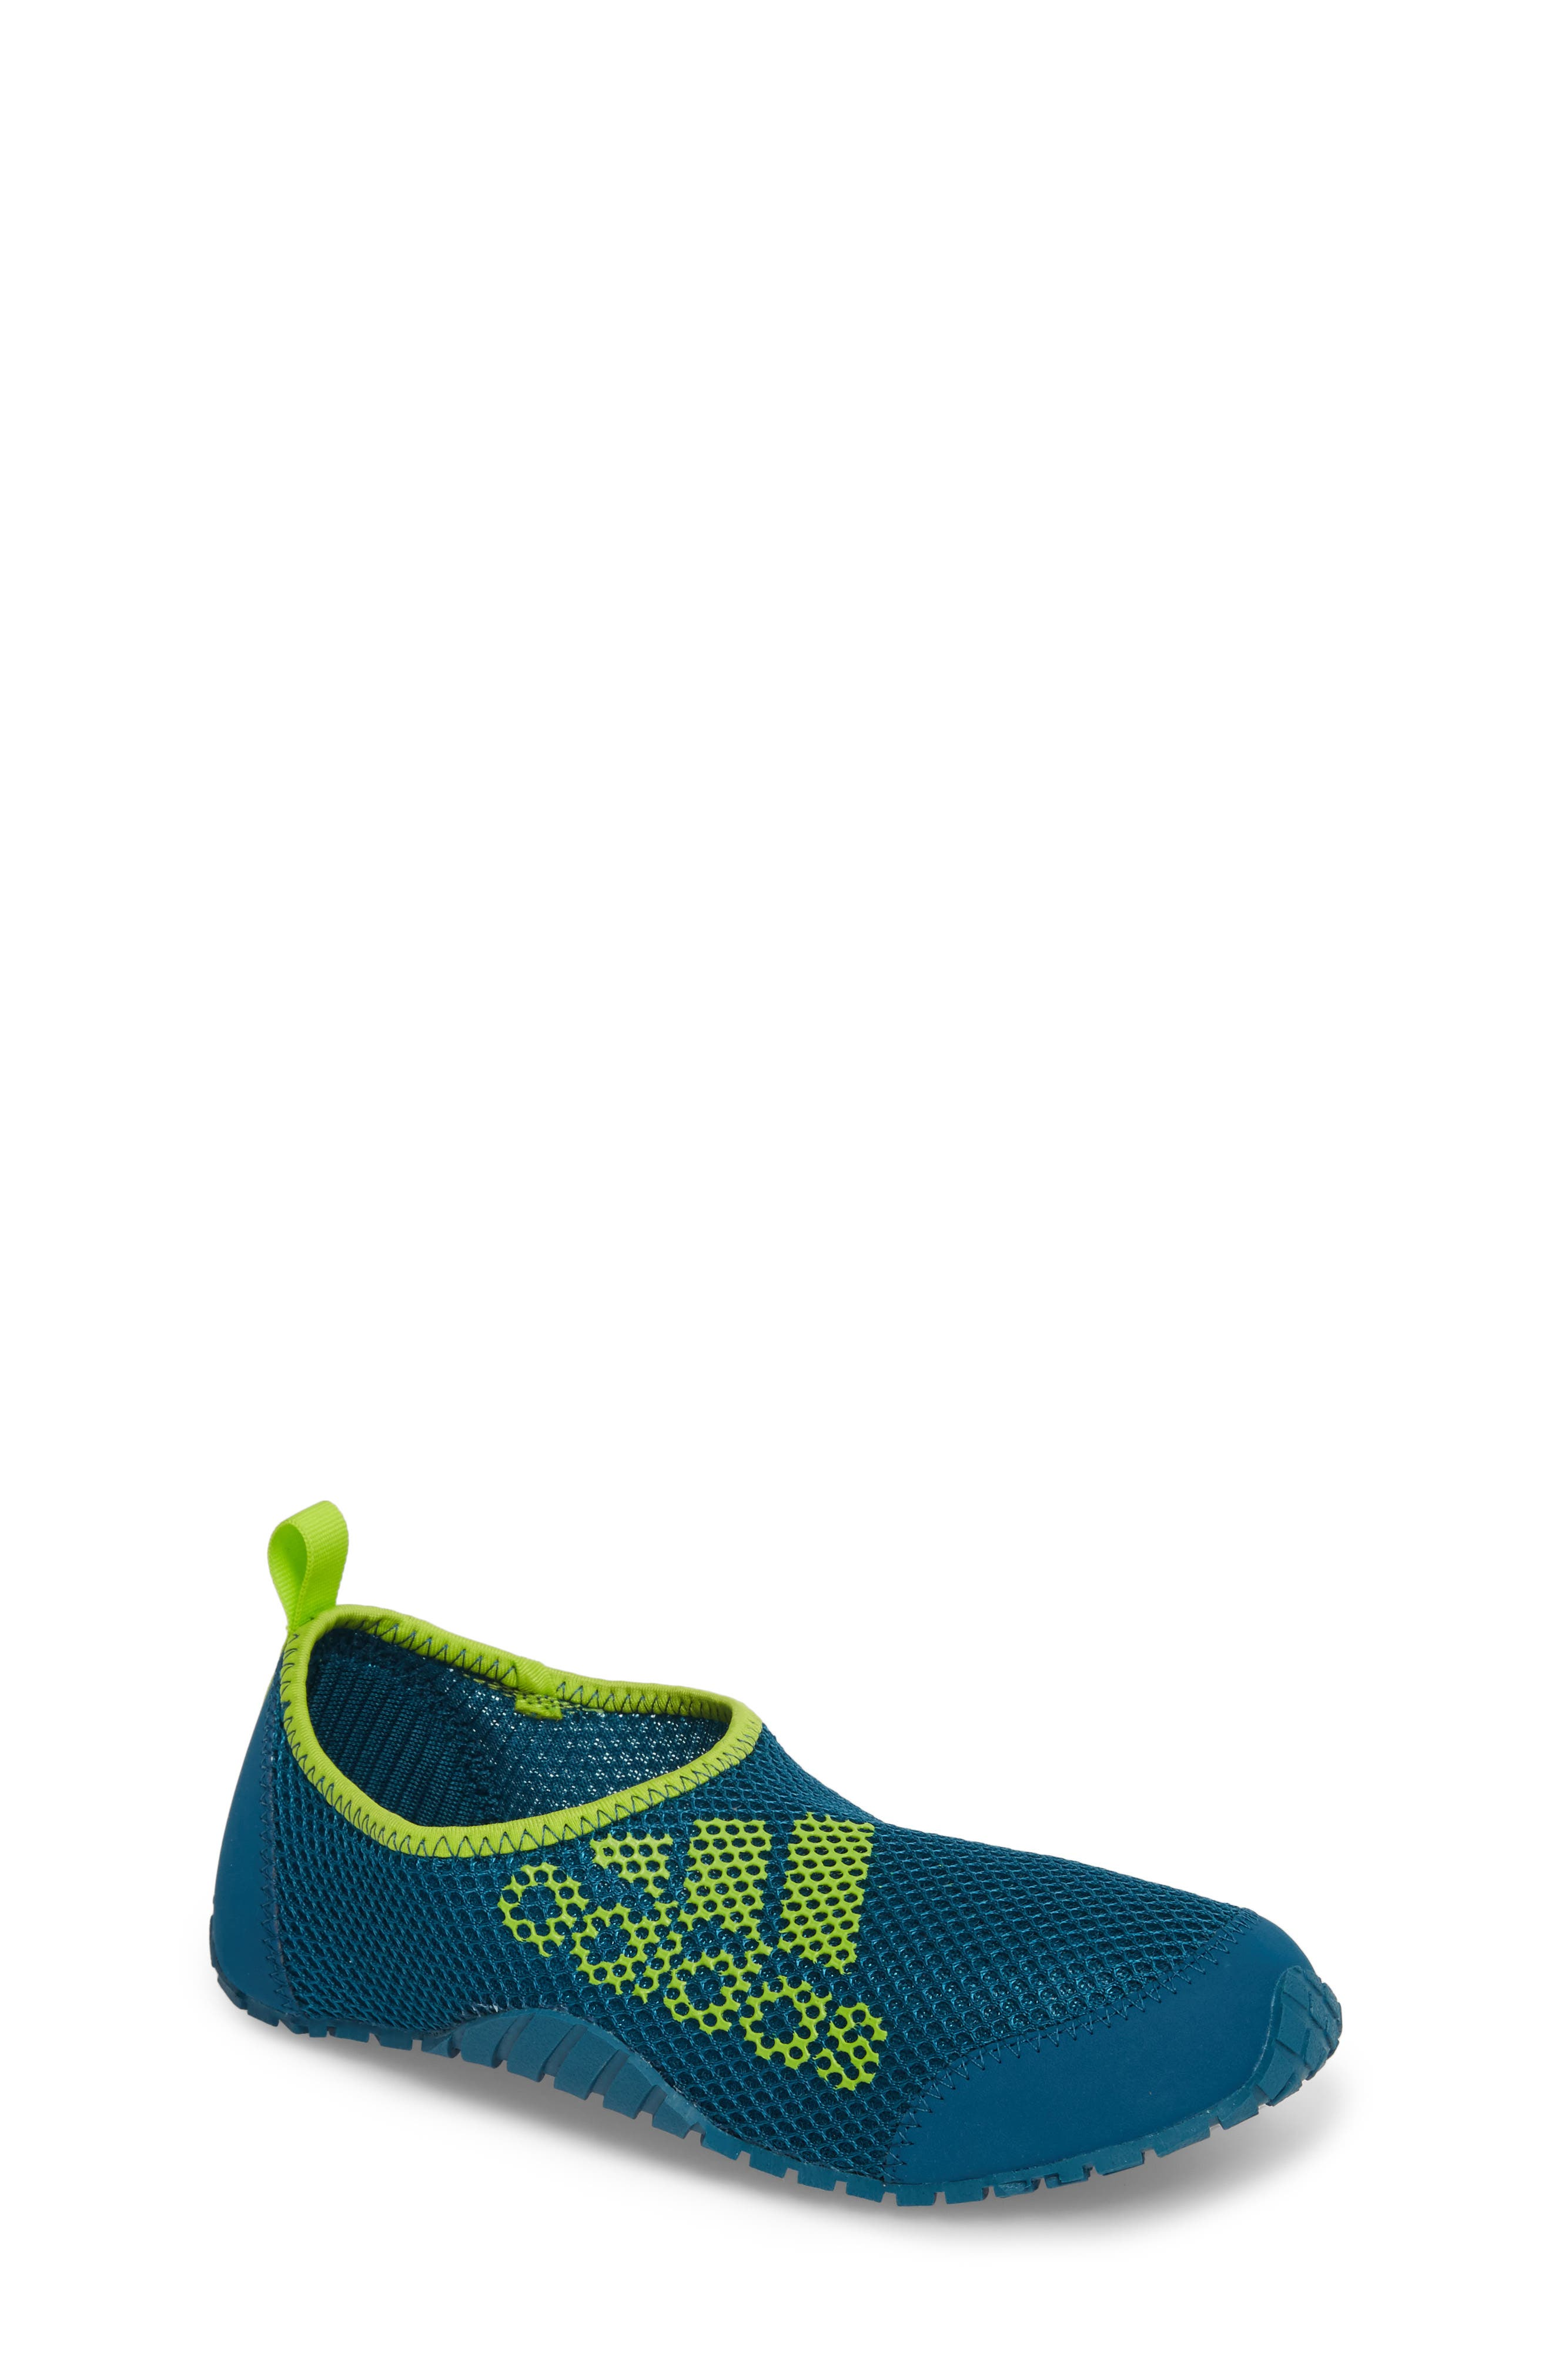 Kurobe Mesh Slip-On Water Shoe,                         Main,                         color, TEAL/ PETROL NIGHT/ SOLAR